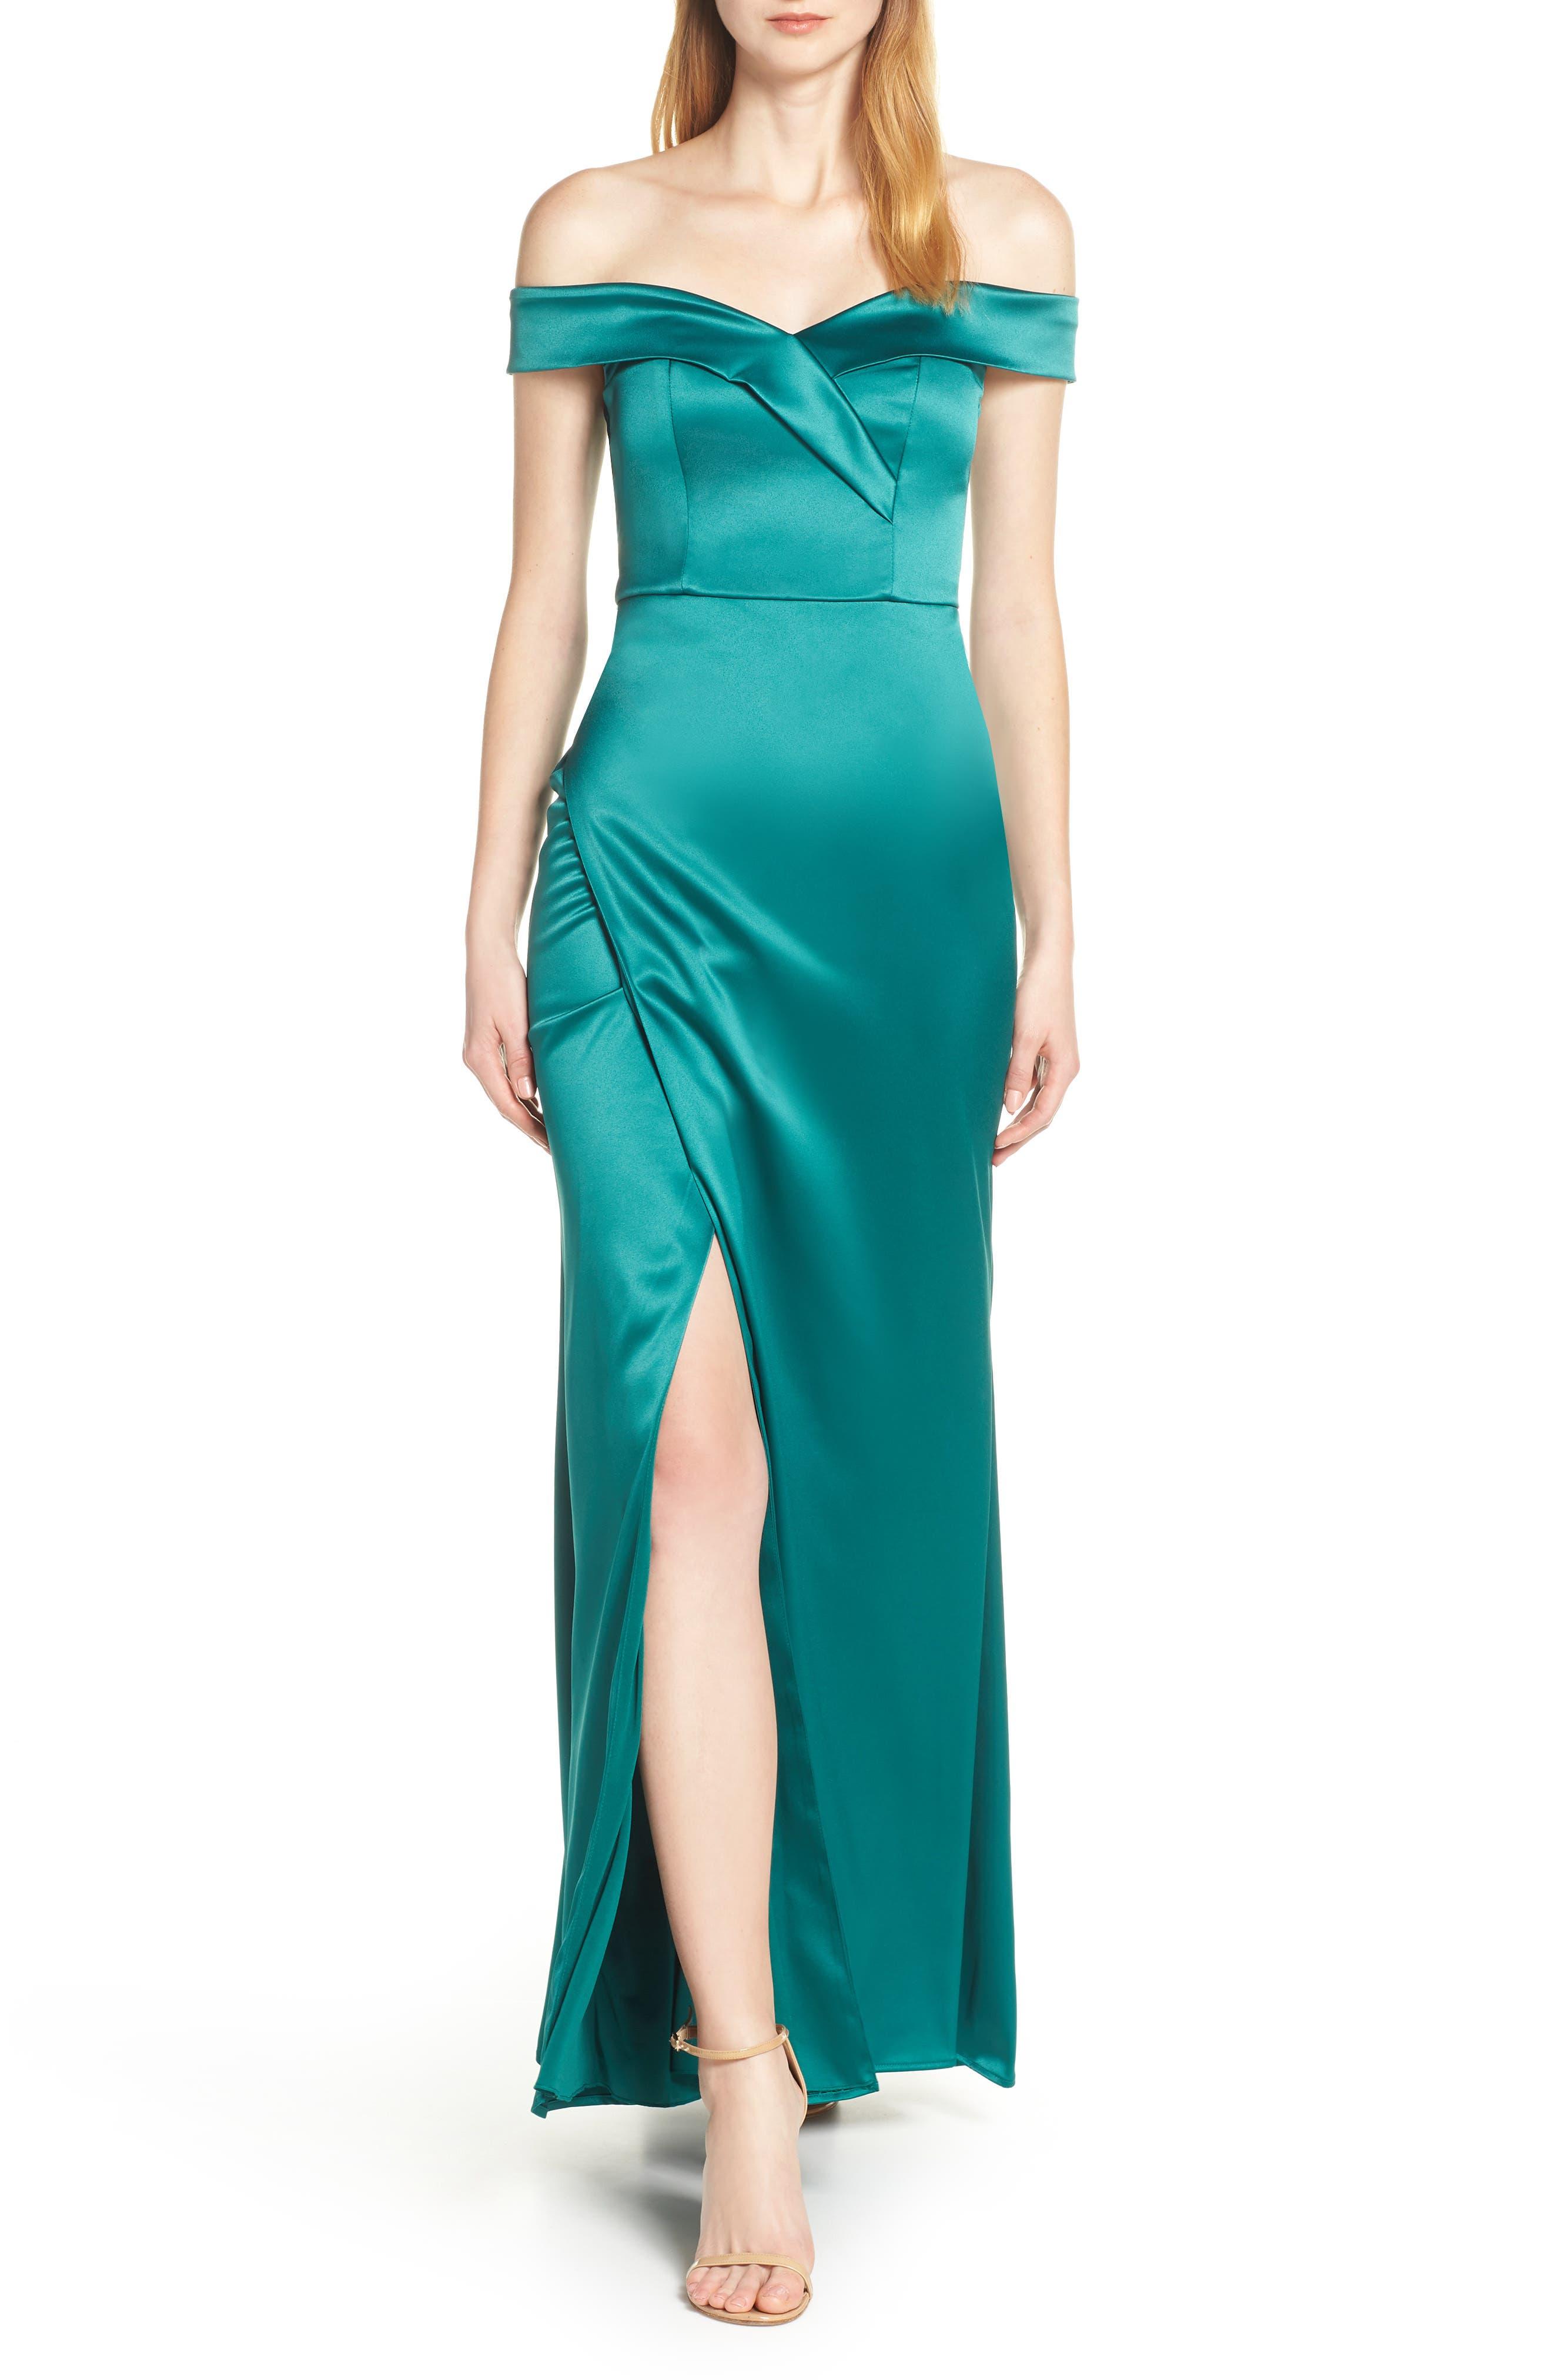 Sequin Hearts Off The Shoulder Satin Evening Dress, Green